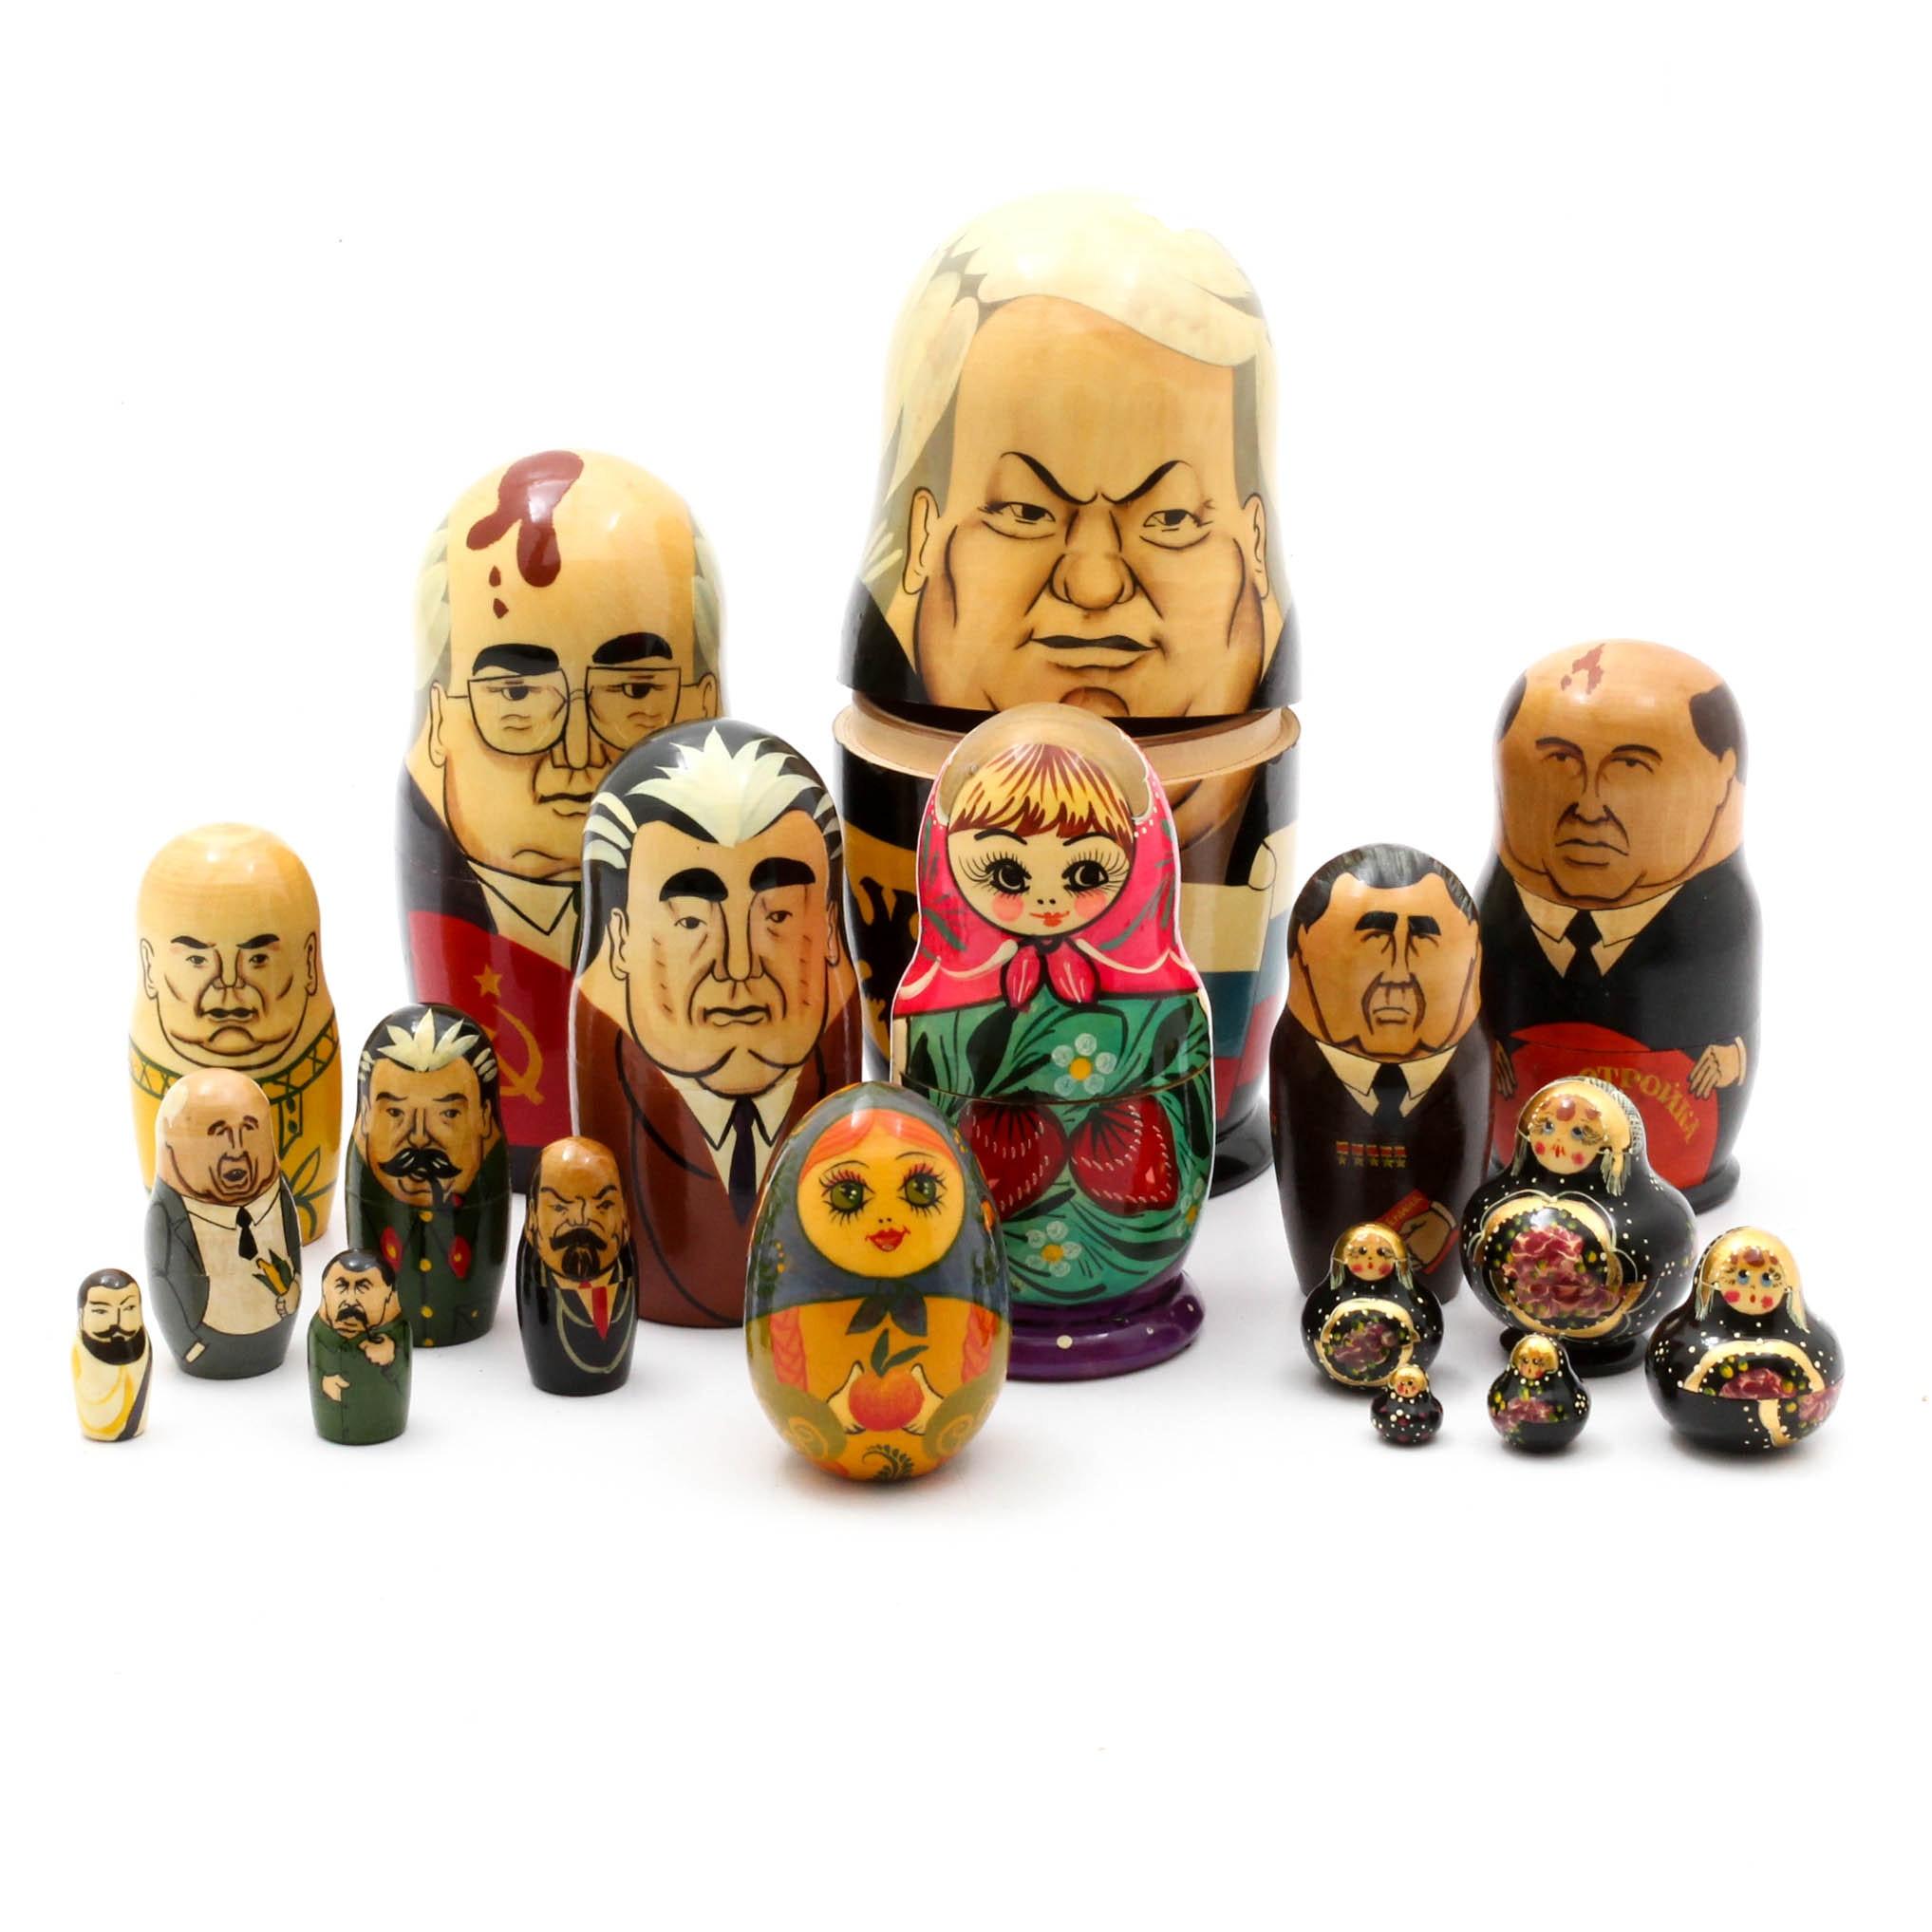 Russian Matryoshka Nesting Doll Collection